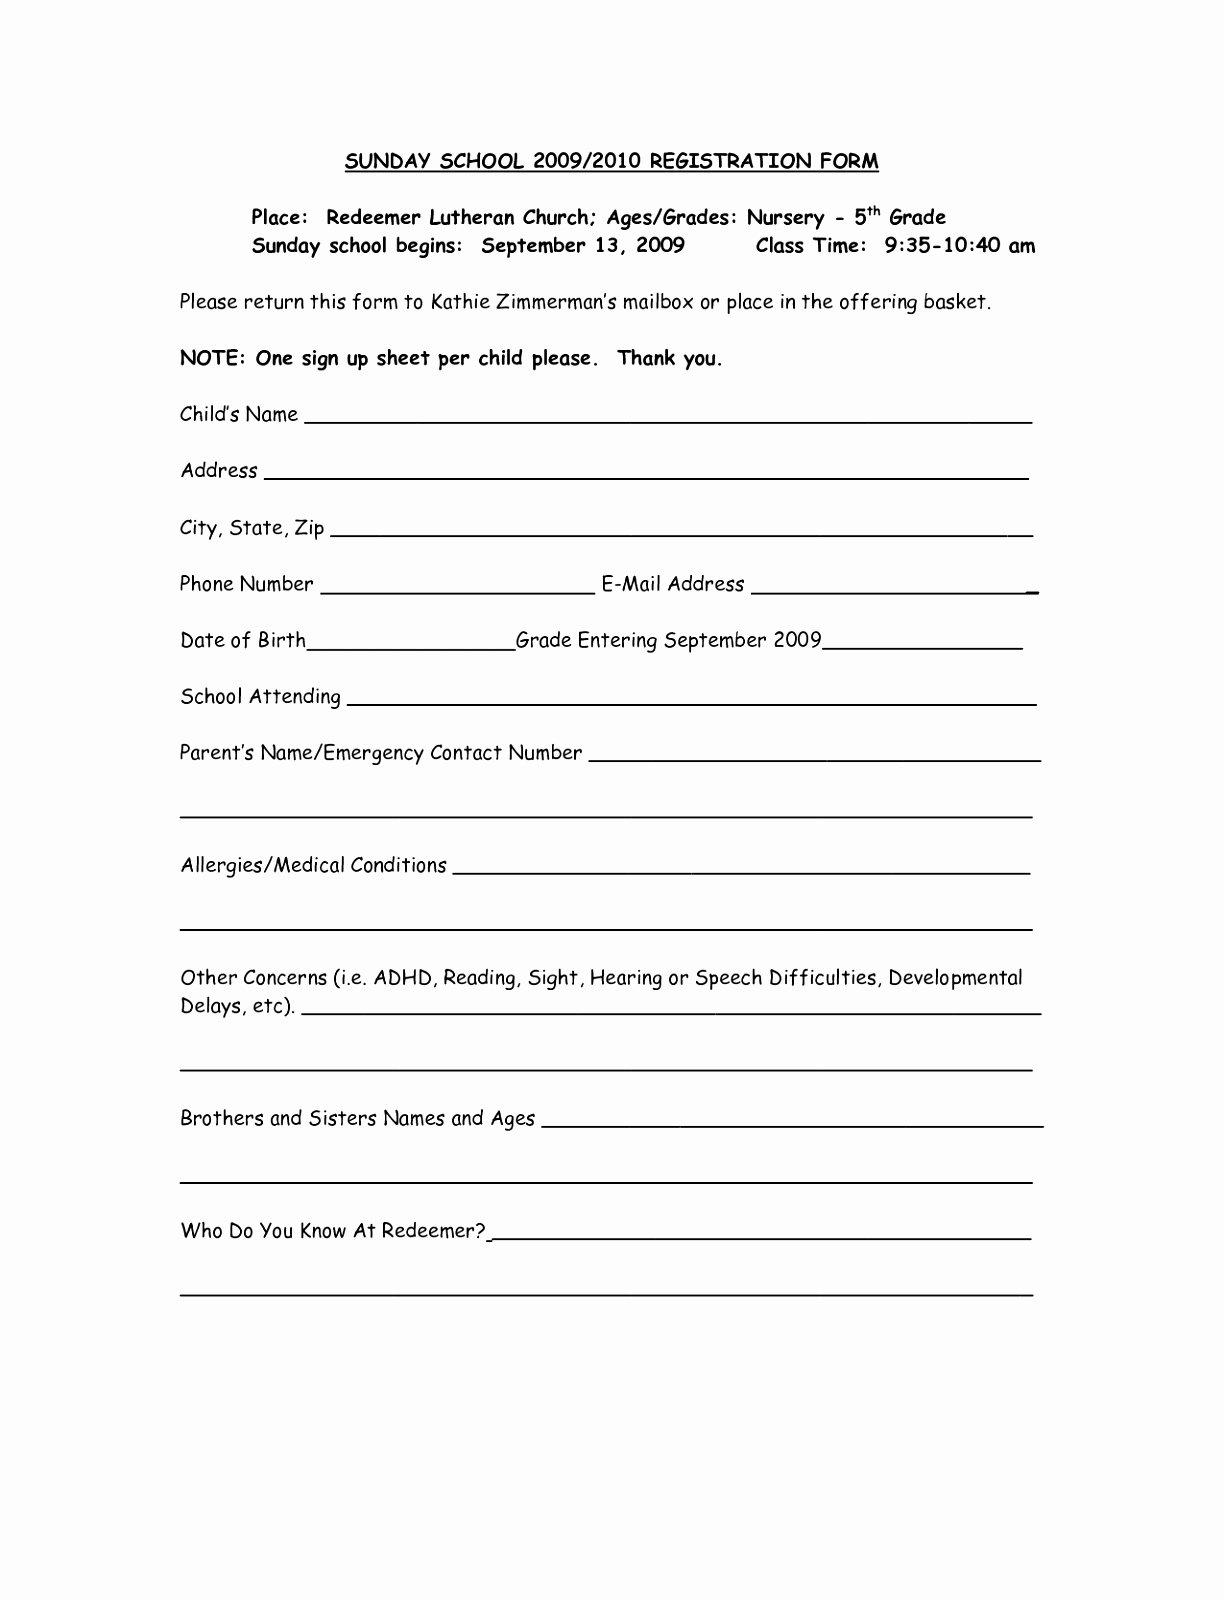 sunday school registration form template